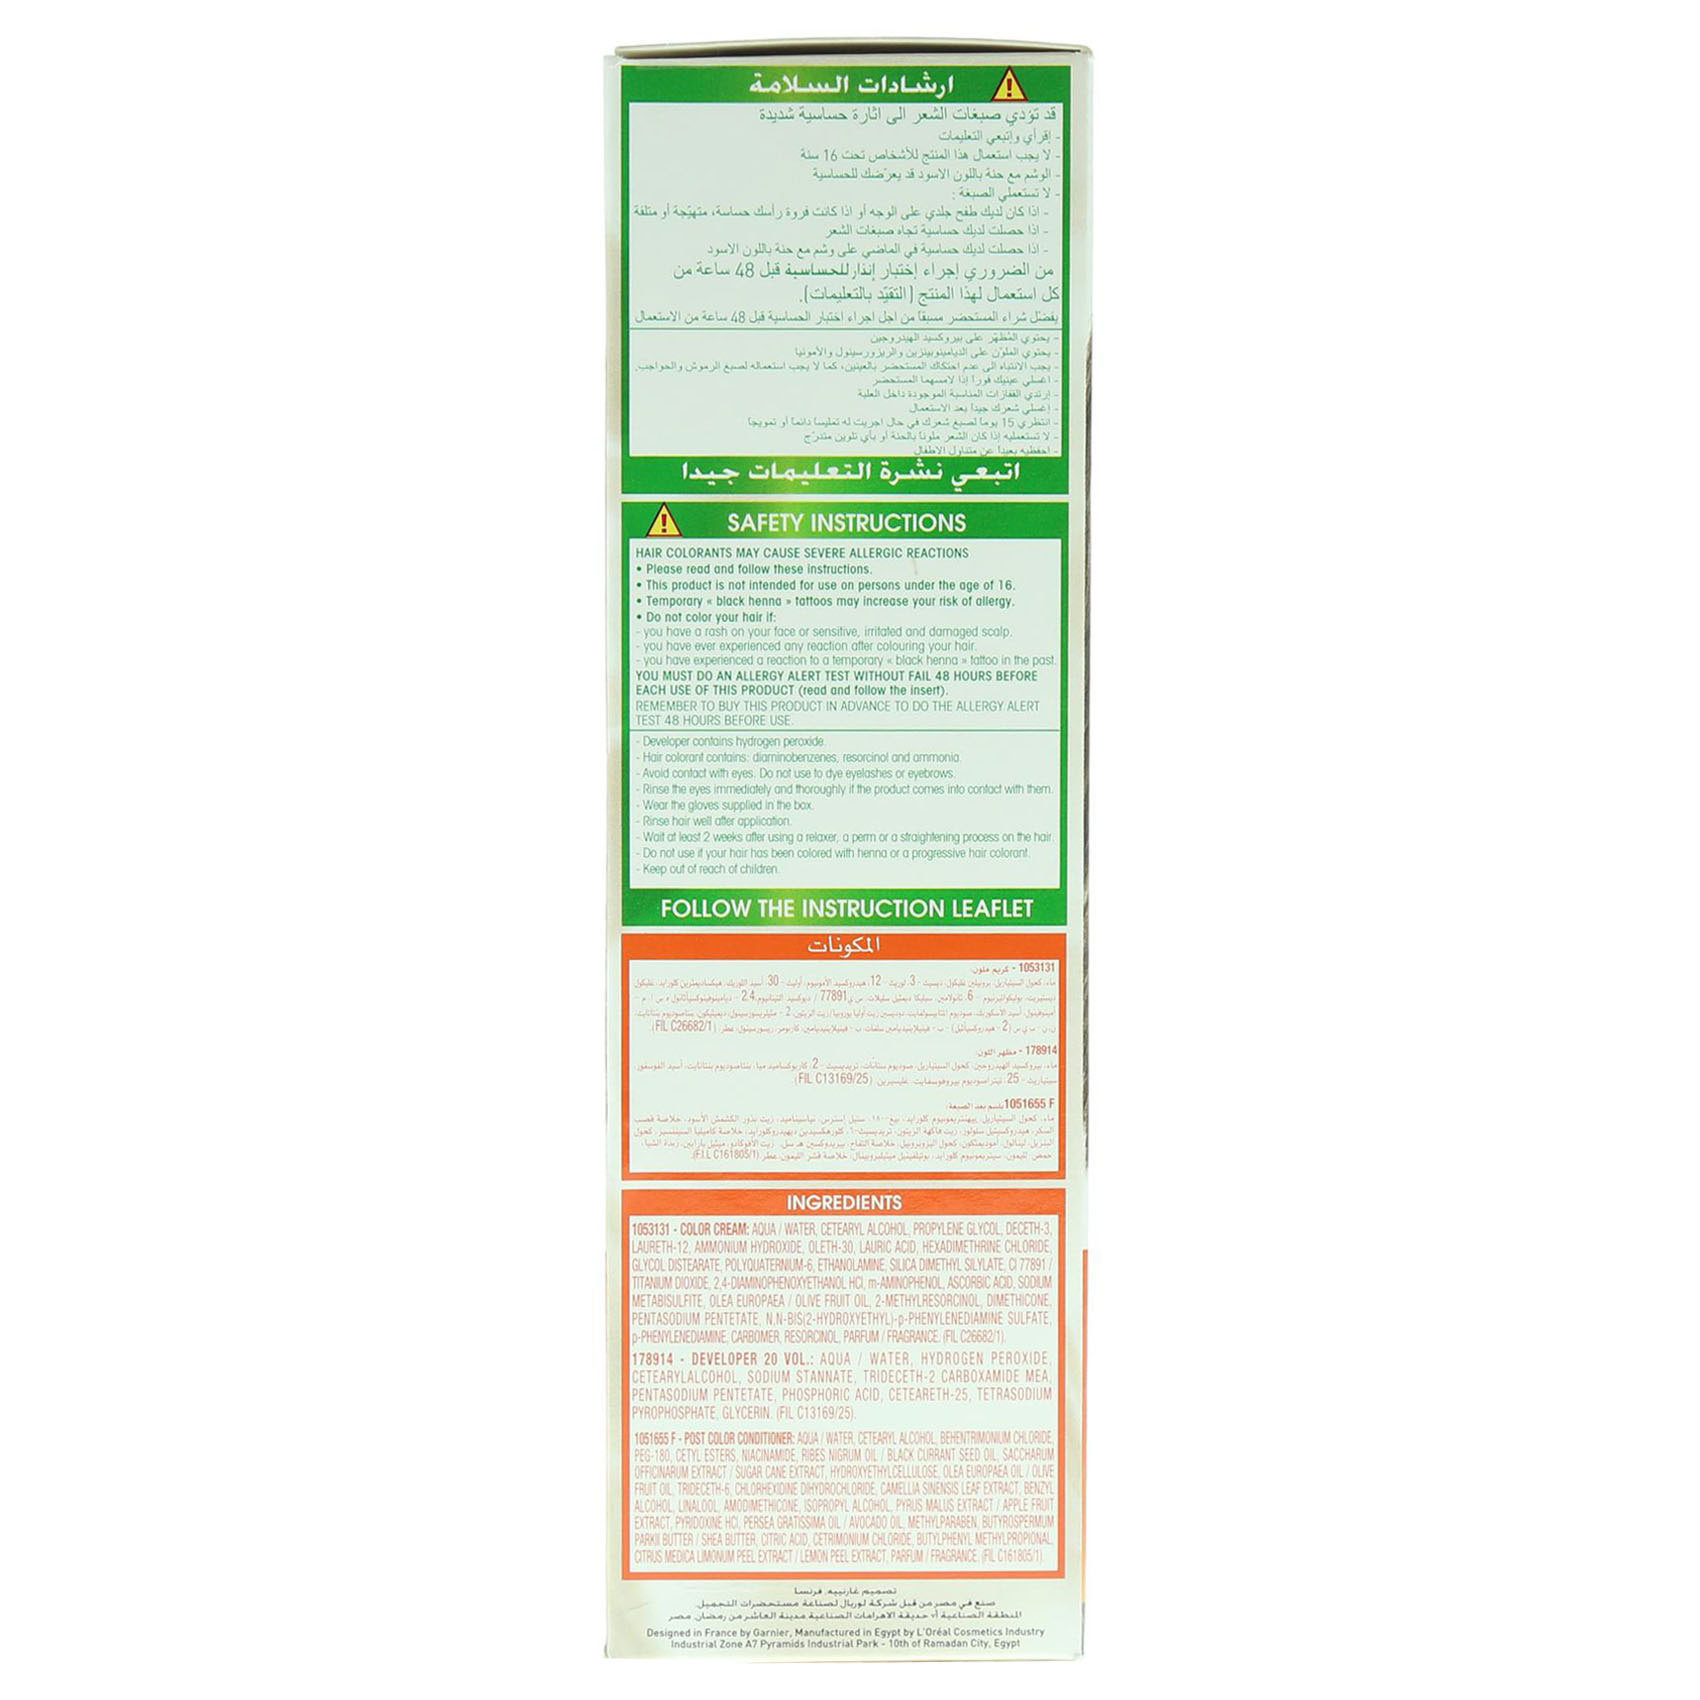 COLOR NATURALS 6.1 DARK ASH BLONDE